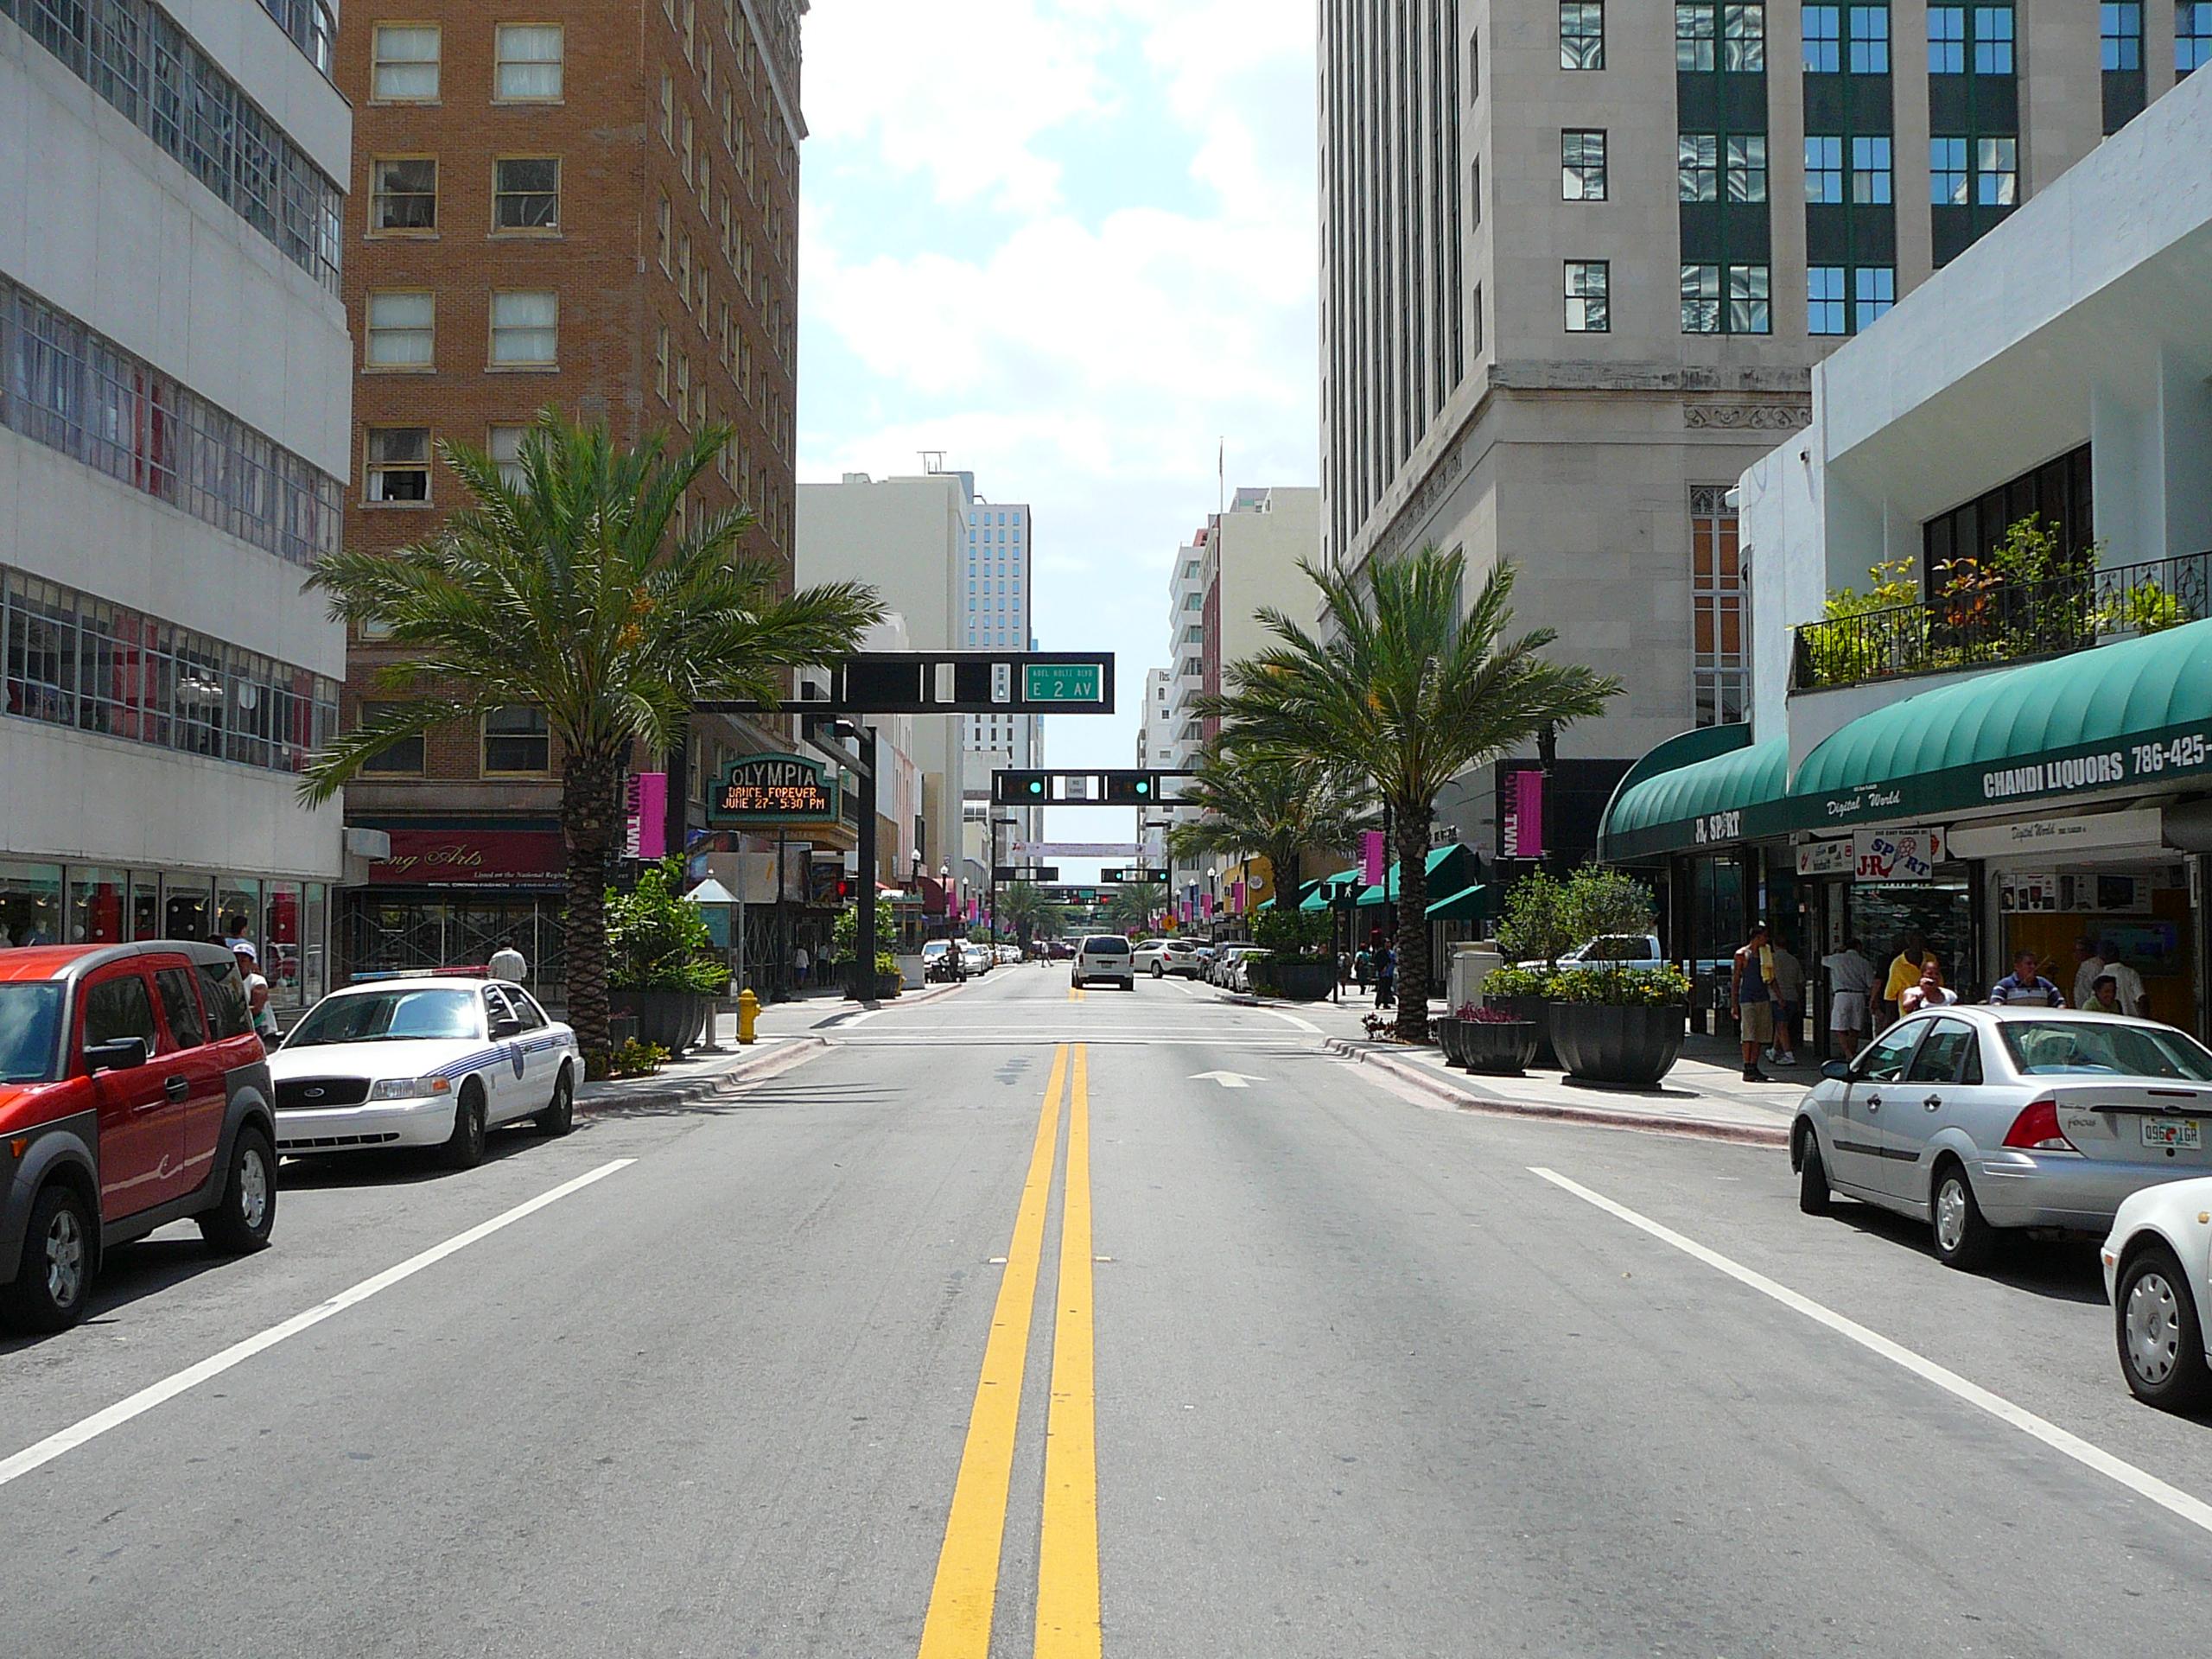 File:Flagler Street.jpg - Wikipedia, the free encyclopedia